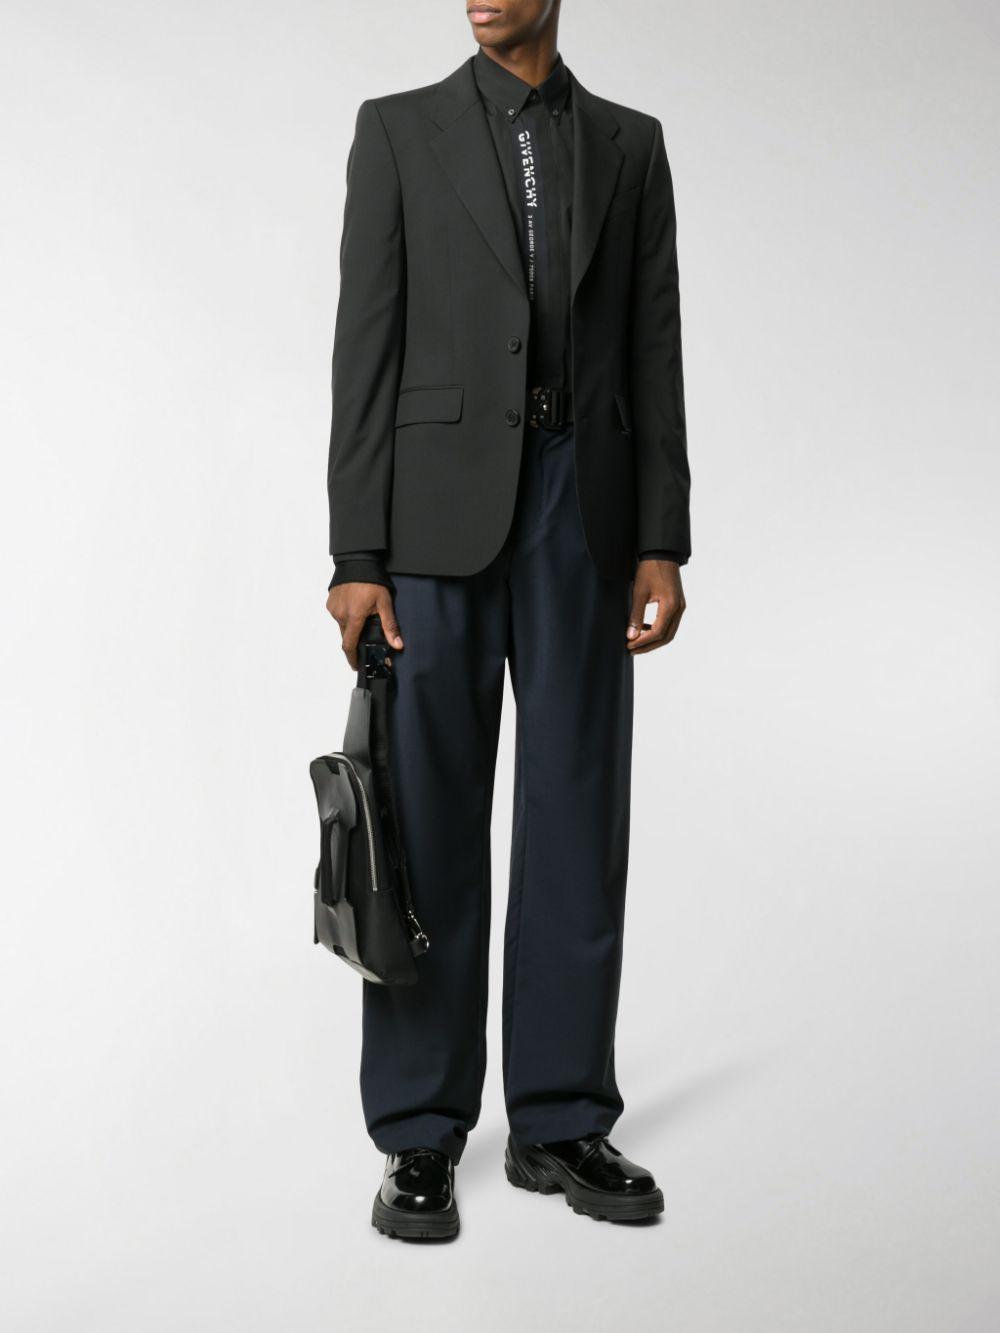 giacca di lana nera a due bottoni con taschino logato Givenchy in bianco GIVENCHY | Giacche | BM307P100B001